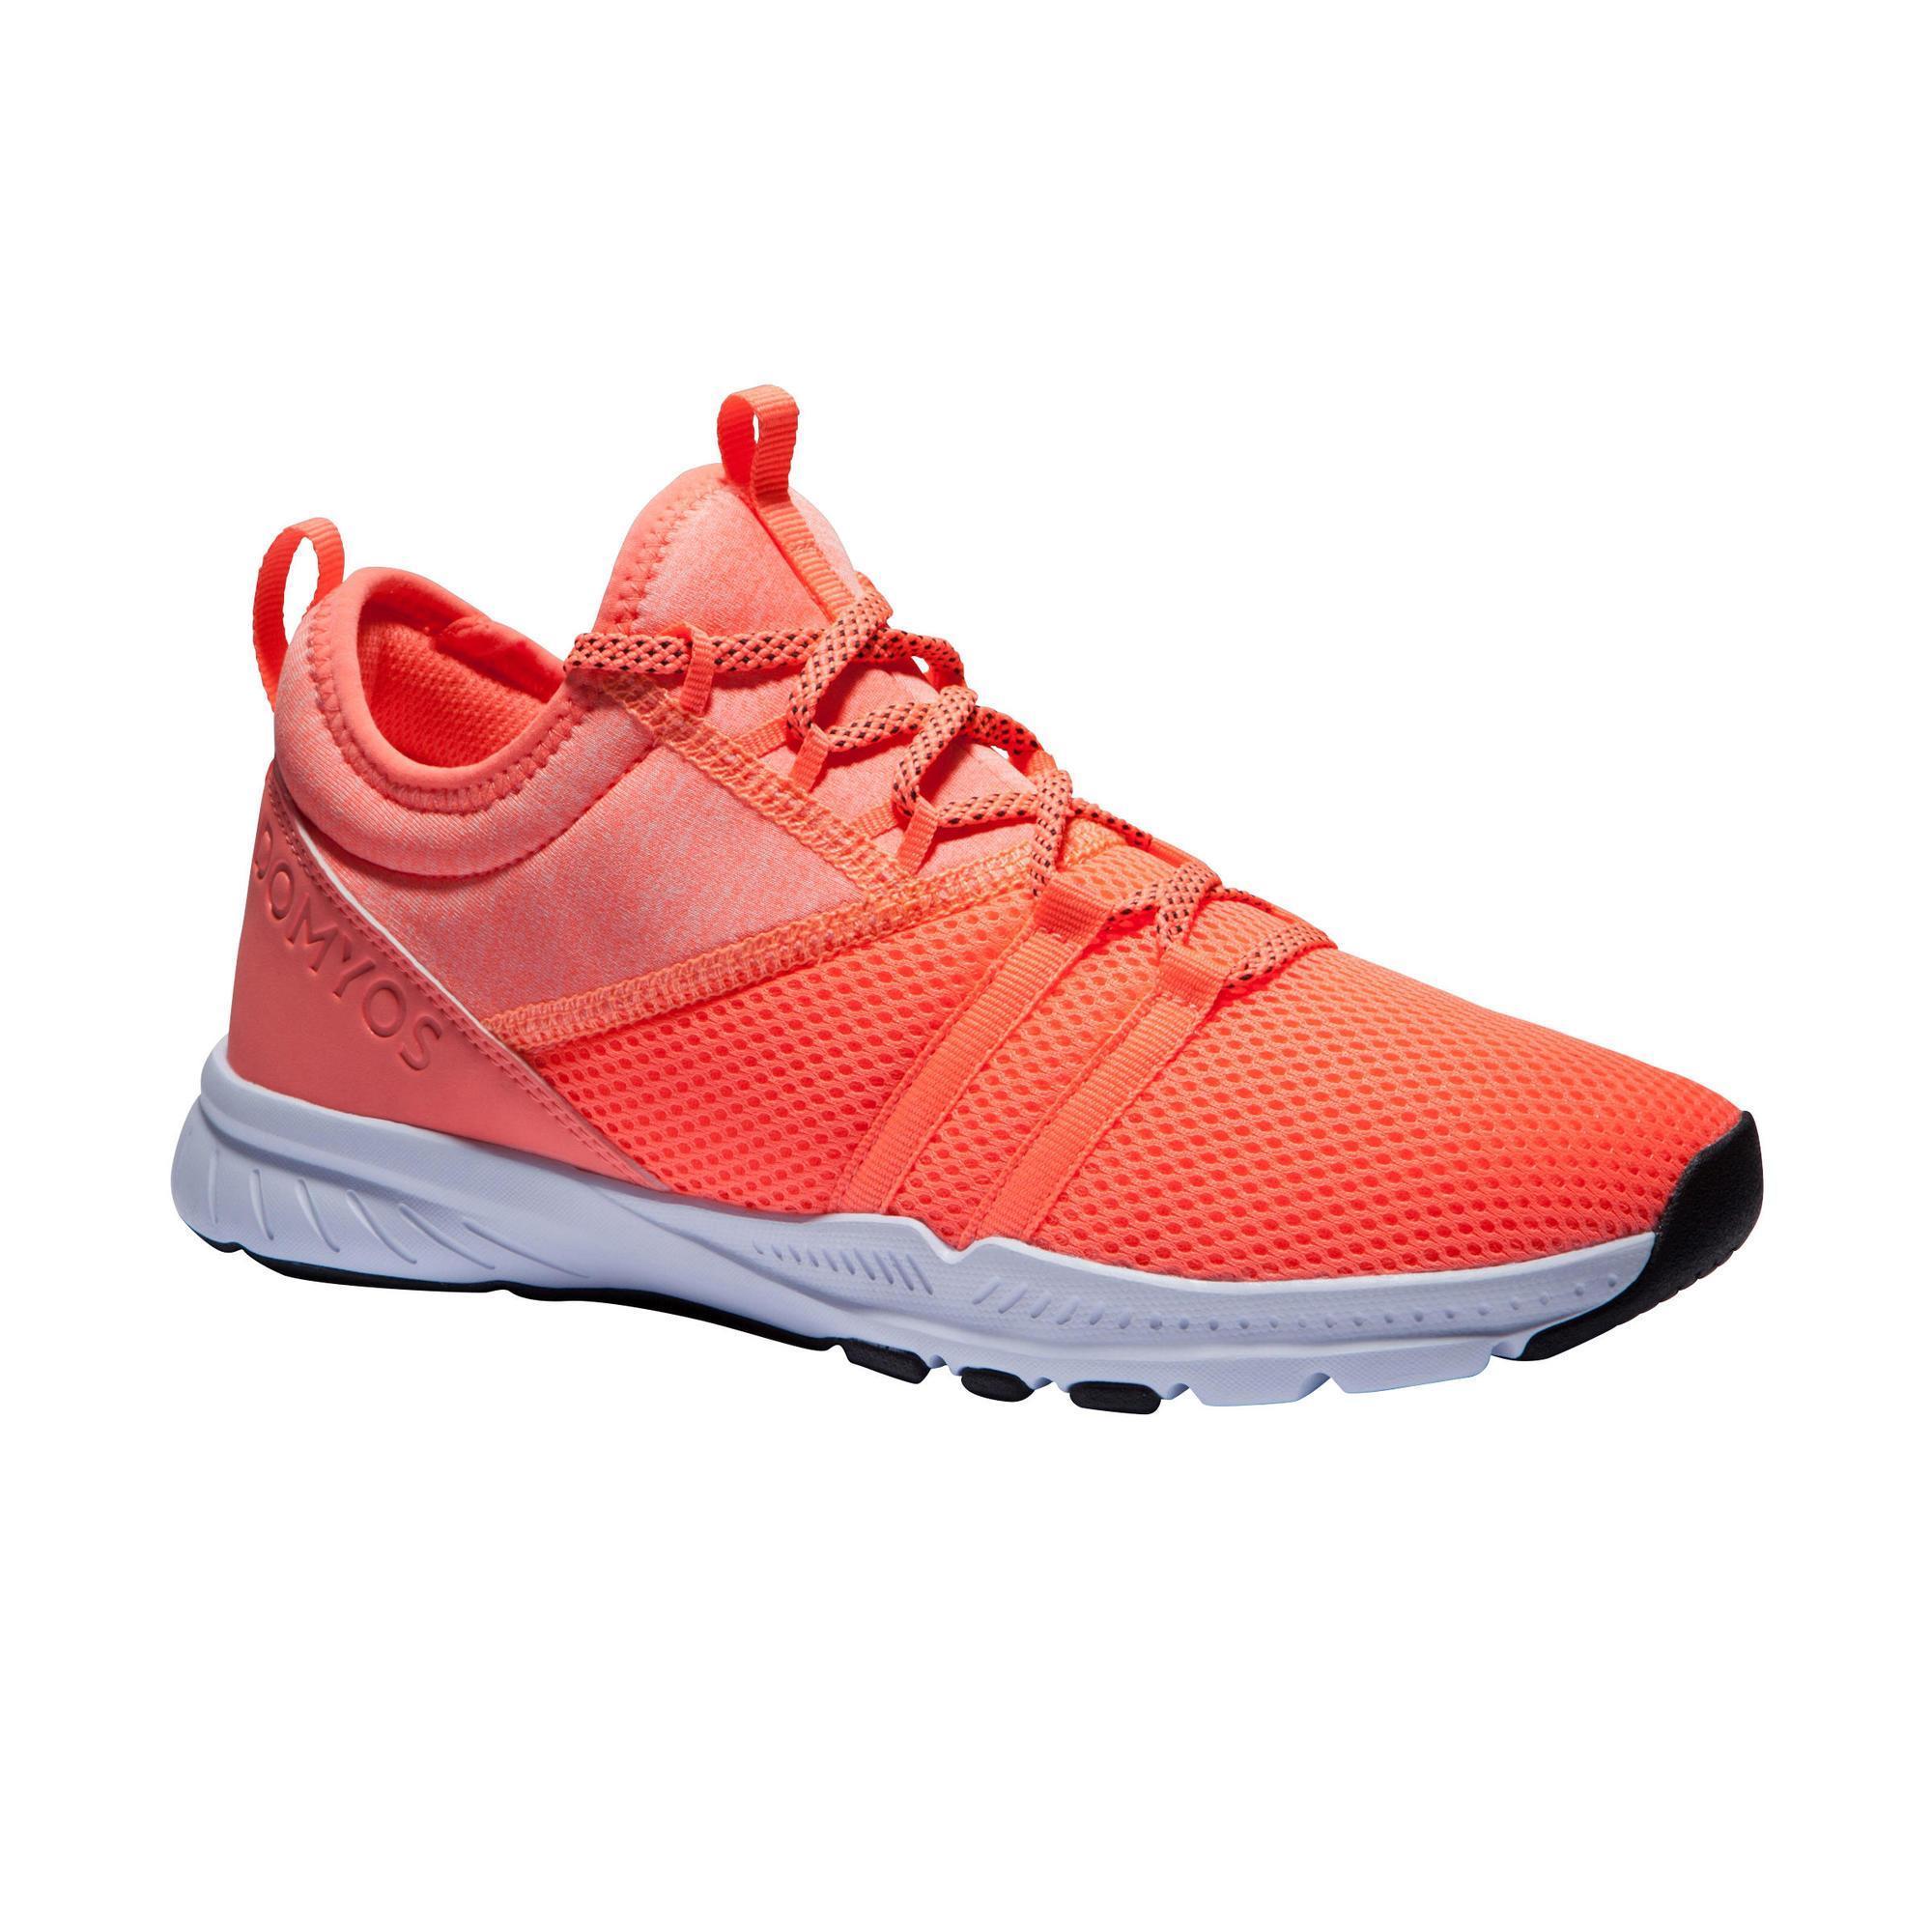 Fitnessschuhe Fitness Cardio 120 Mid Damen koralle | Schuhe > Sportschuhe > Fitnessschuhe | Rot - Rosa | Domyos